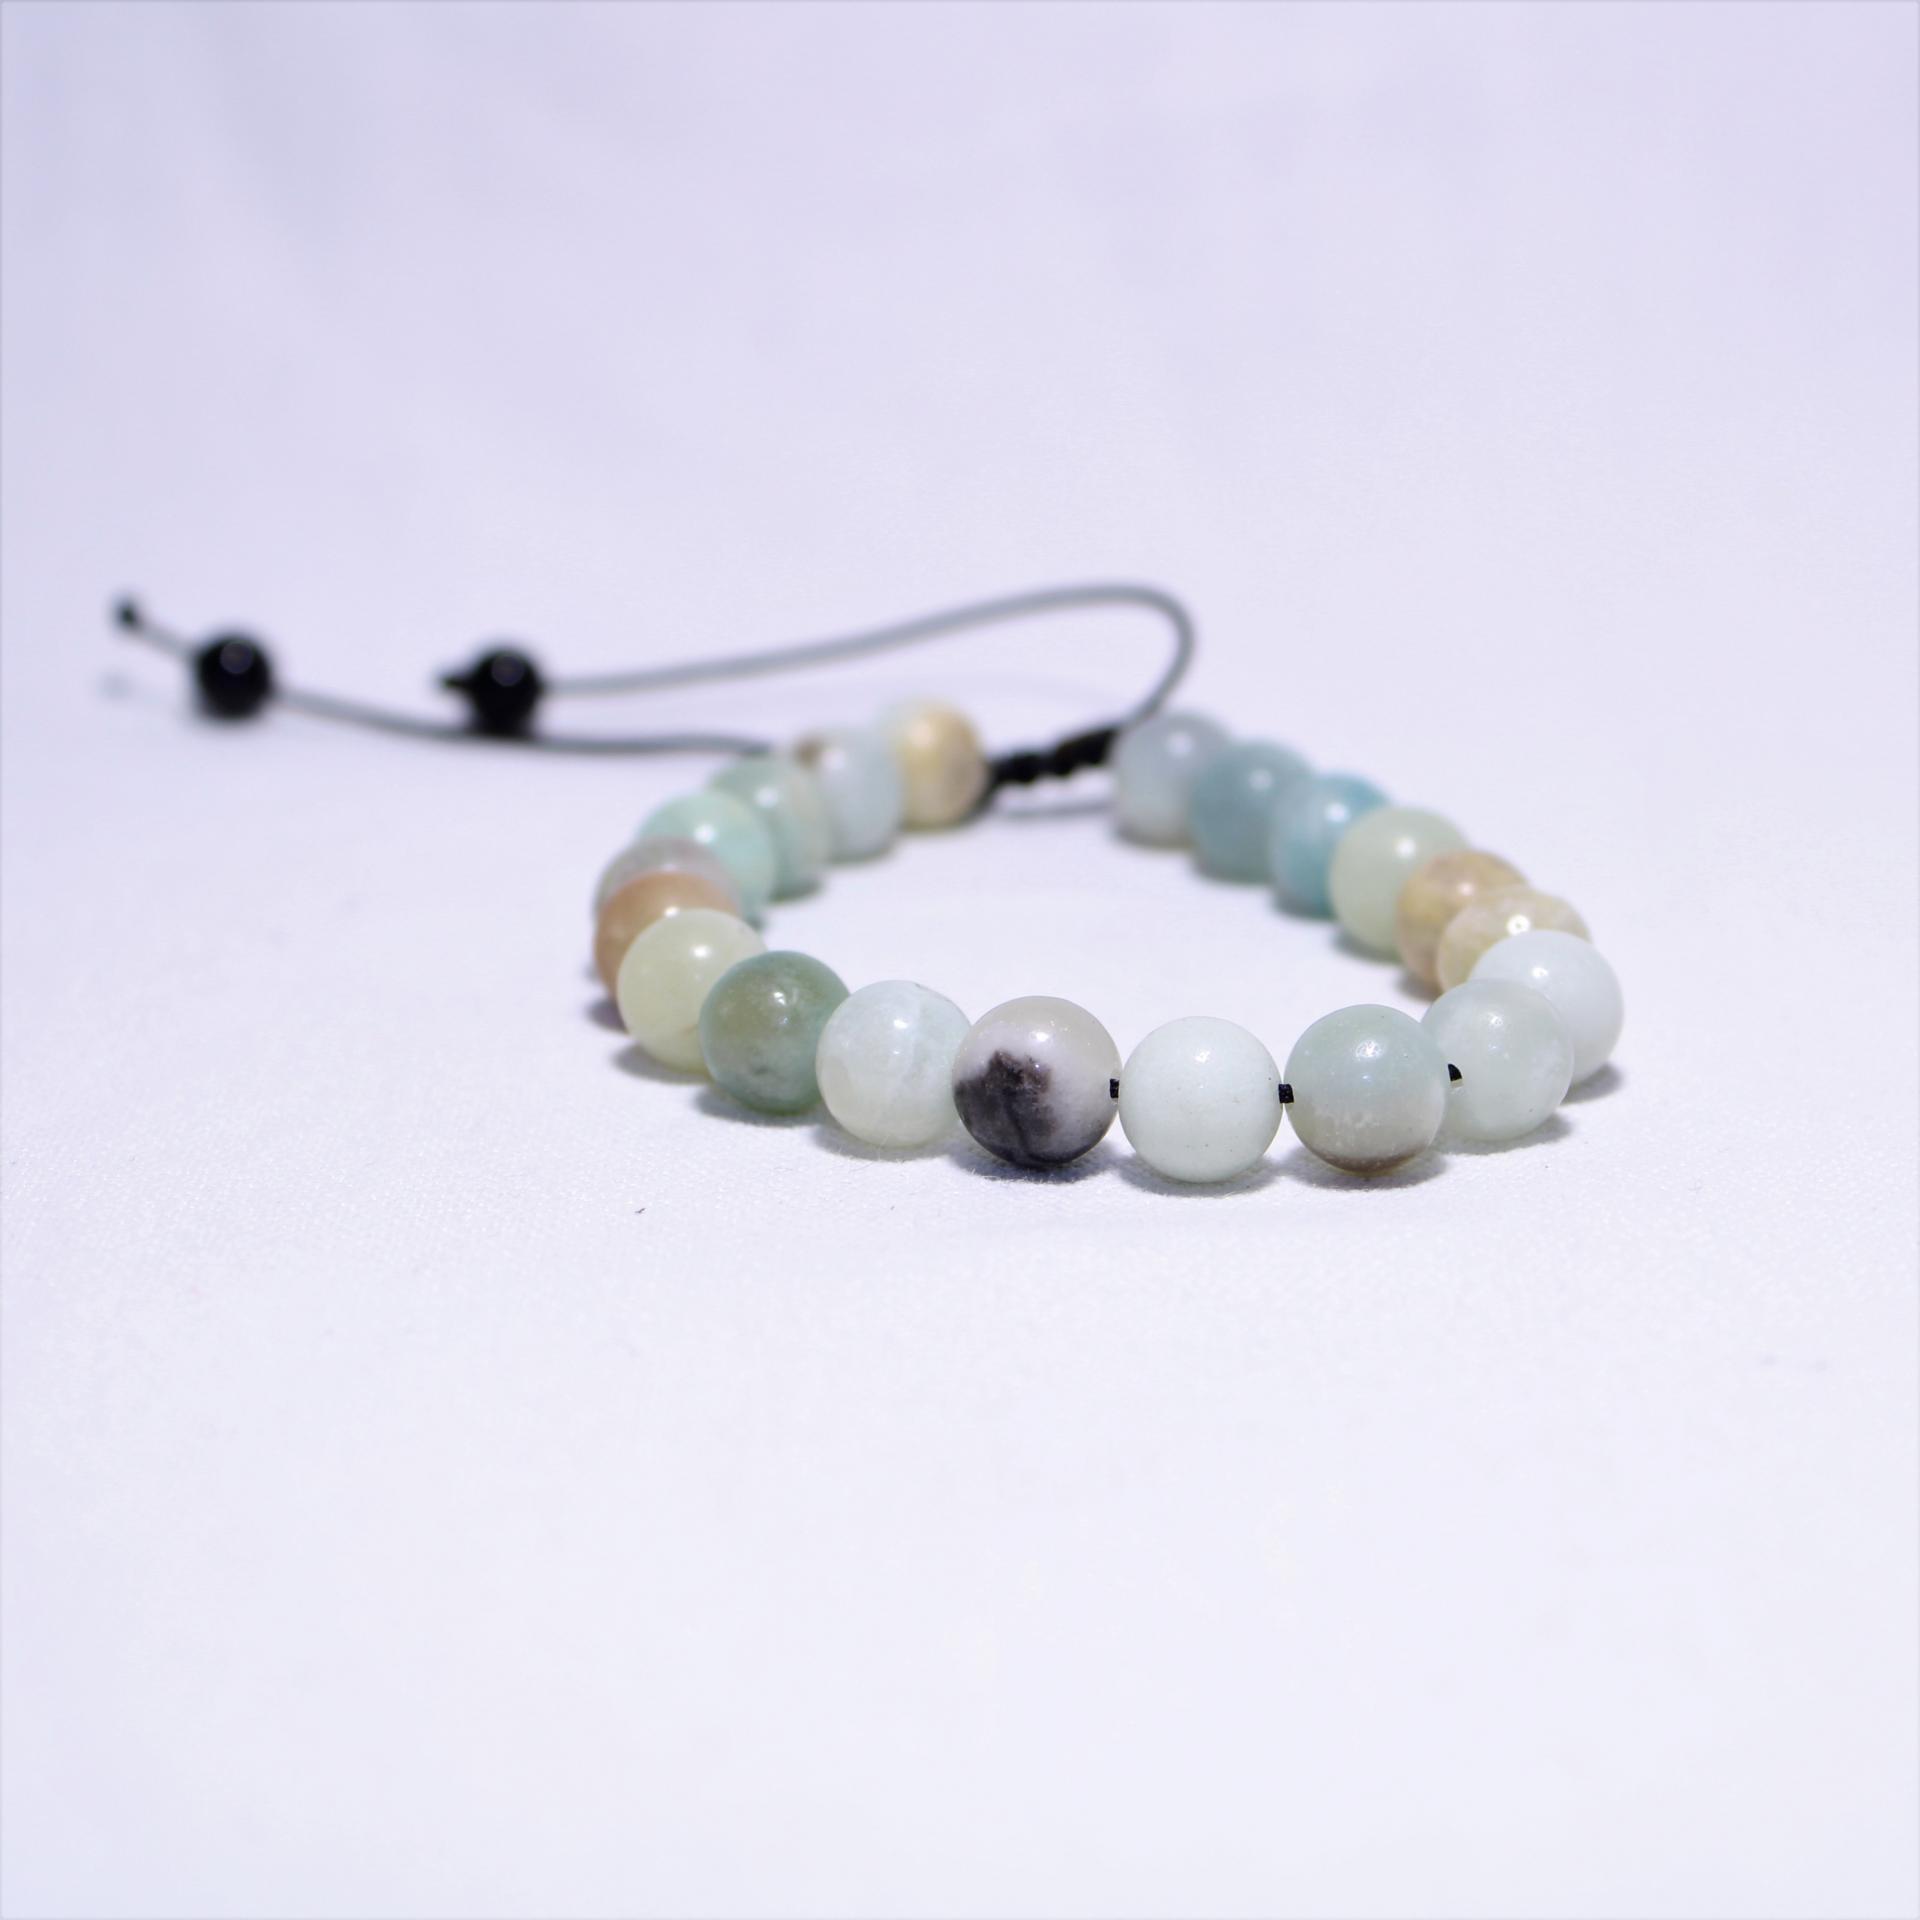 Bracelet amazonite i13 2